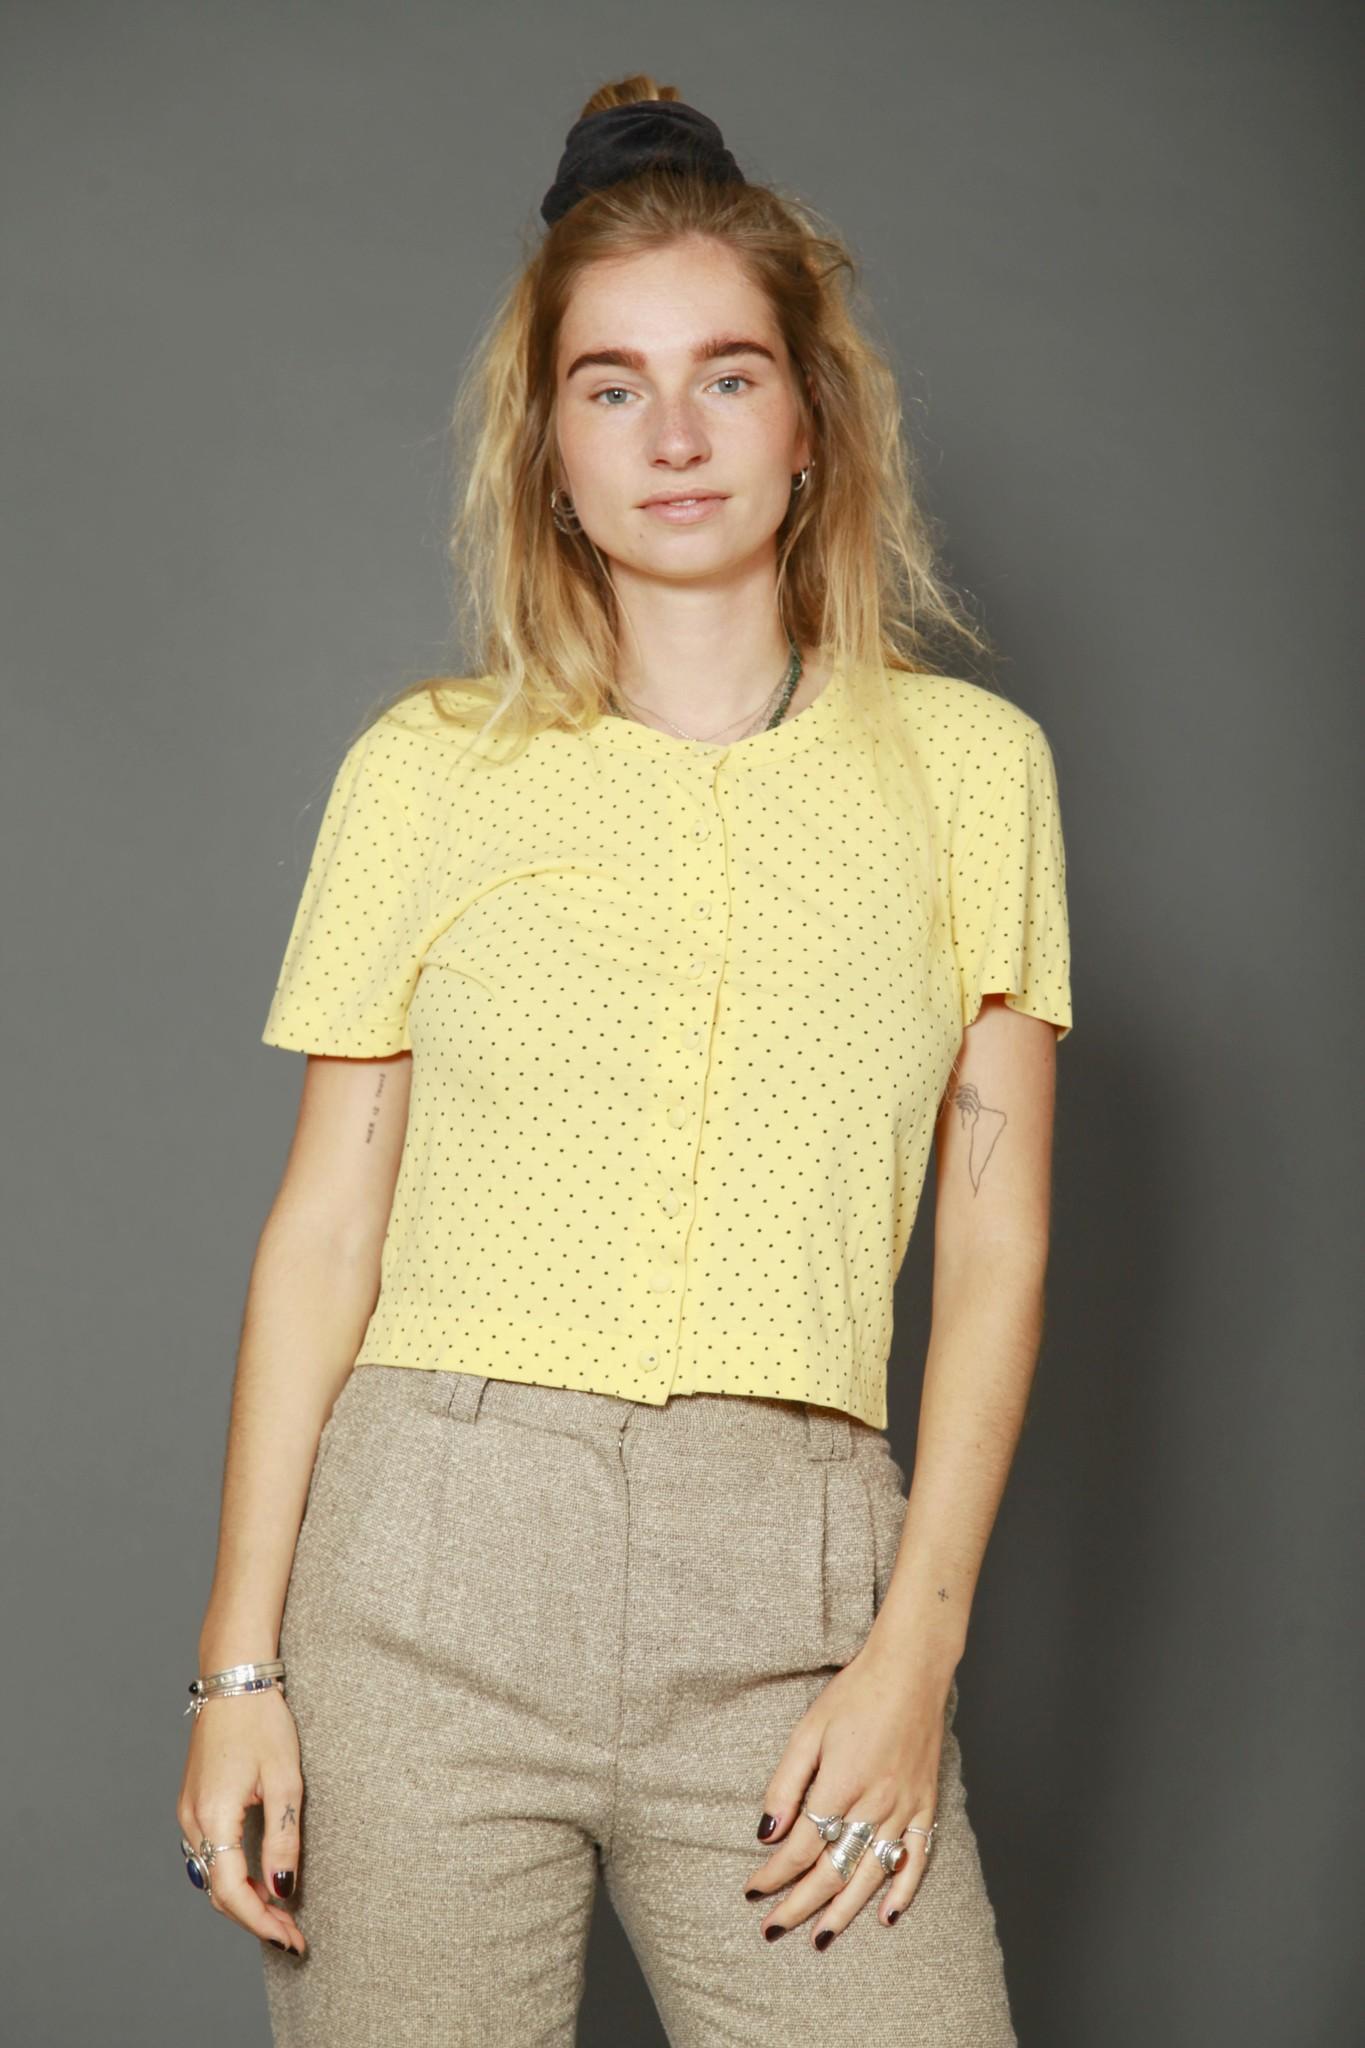 Yellow 80s polka dot top